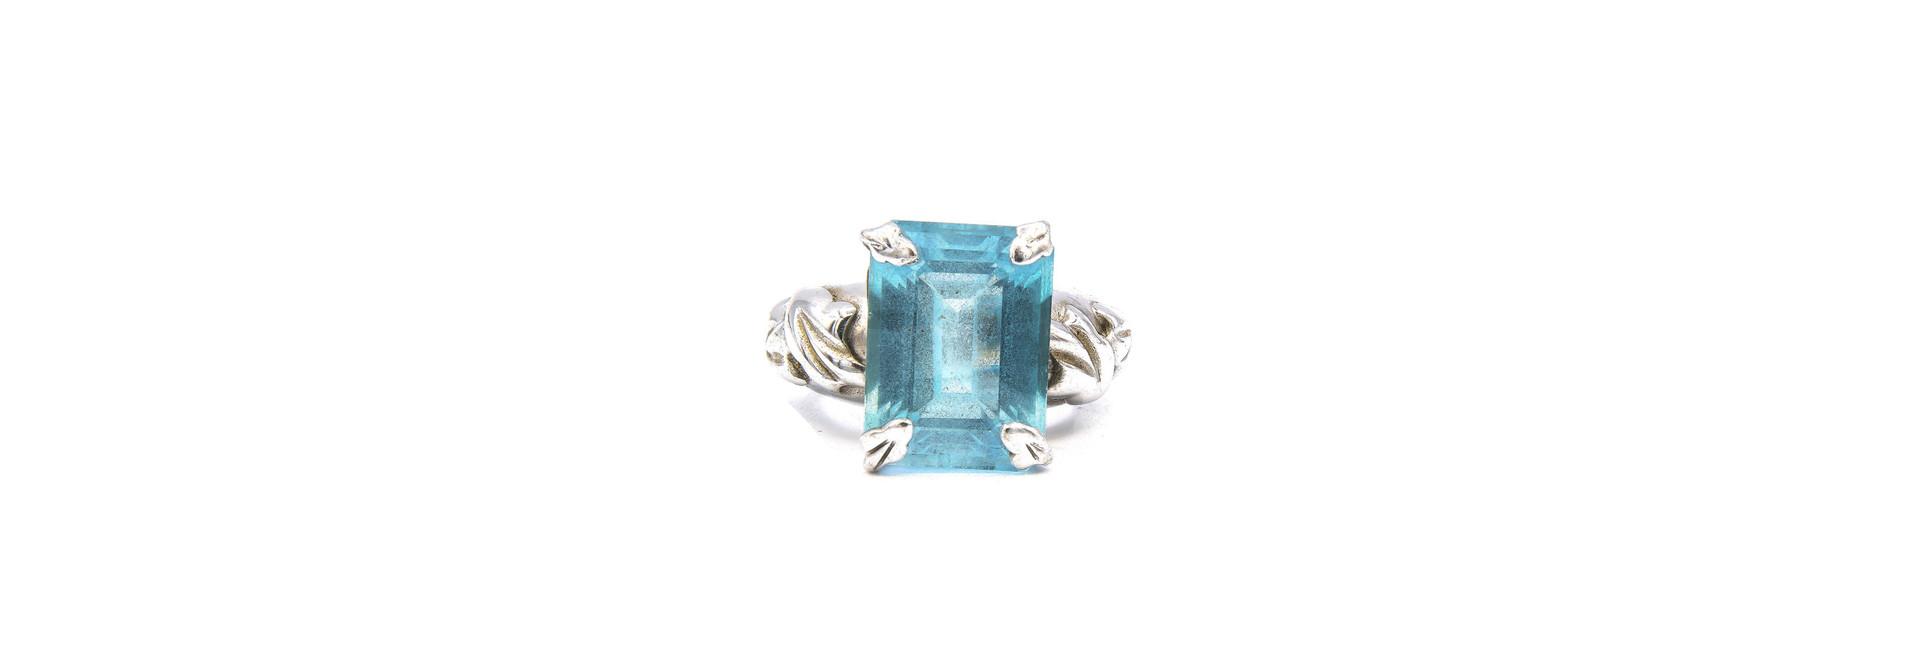 Ring met lichtblauwe steen witgoud